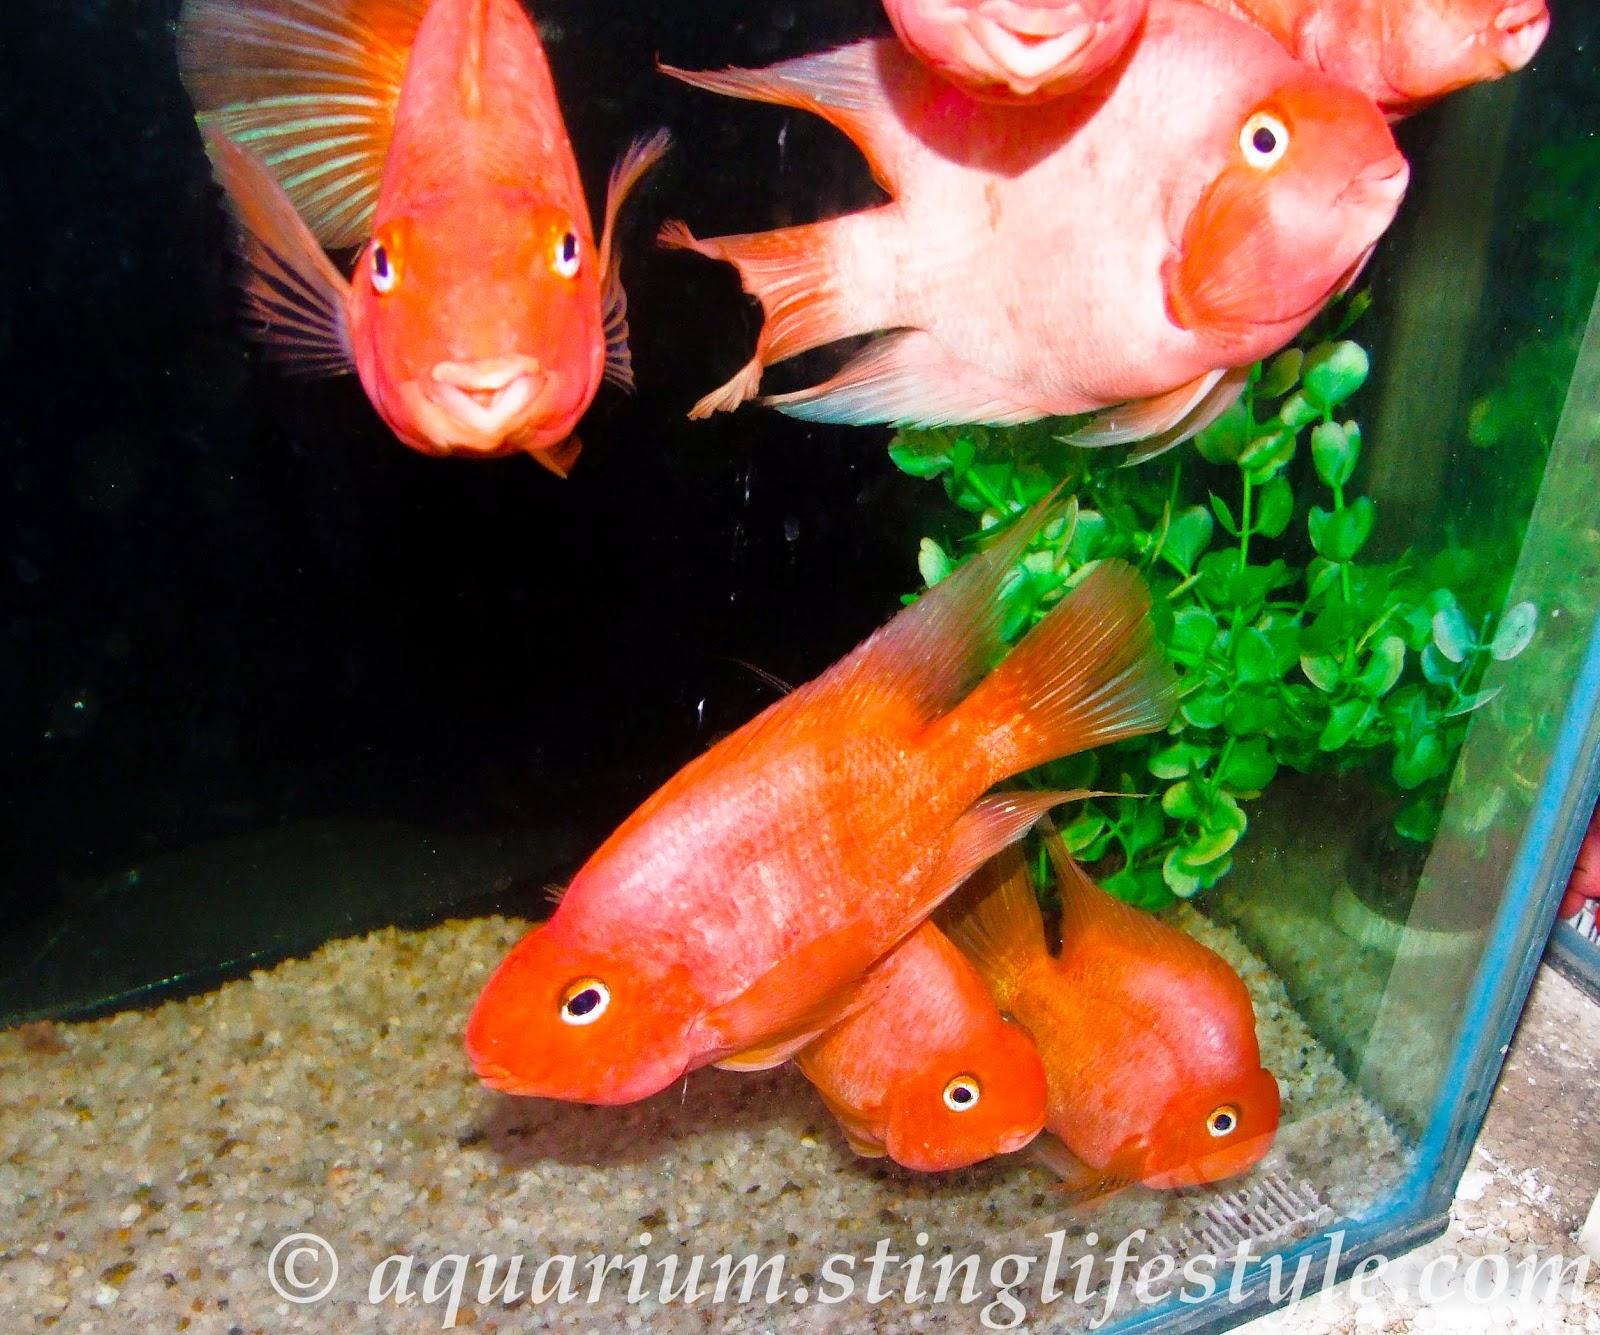 Parrot fish pictures cichlid pictures aquarium info for Pictures of parrot fish